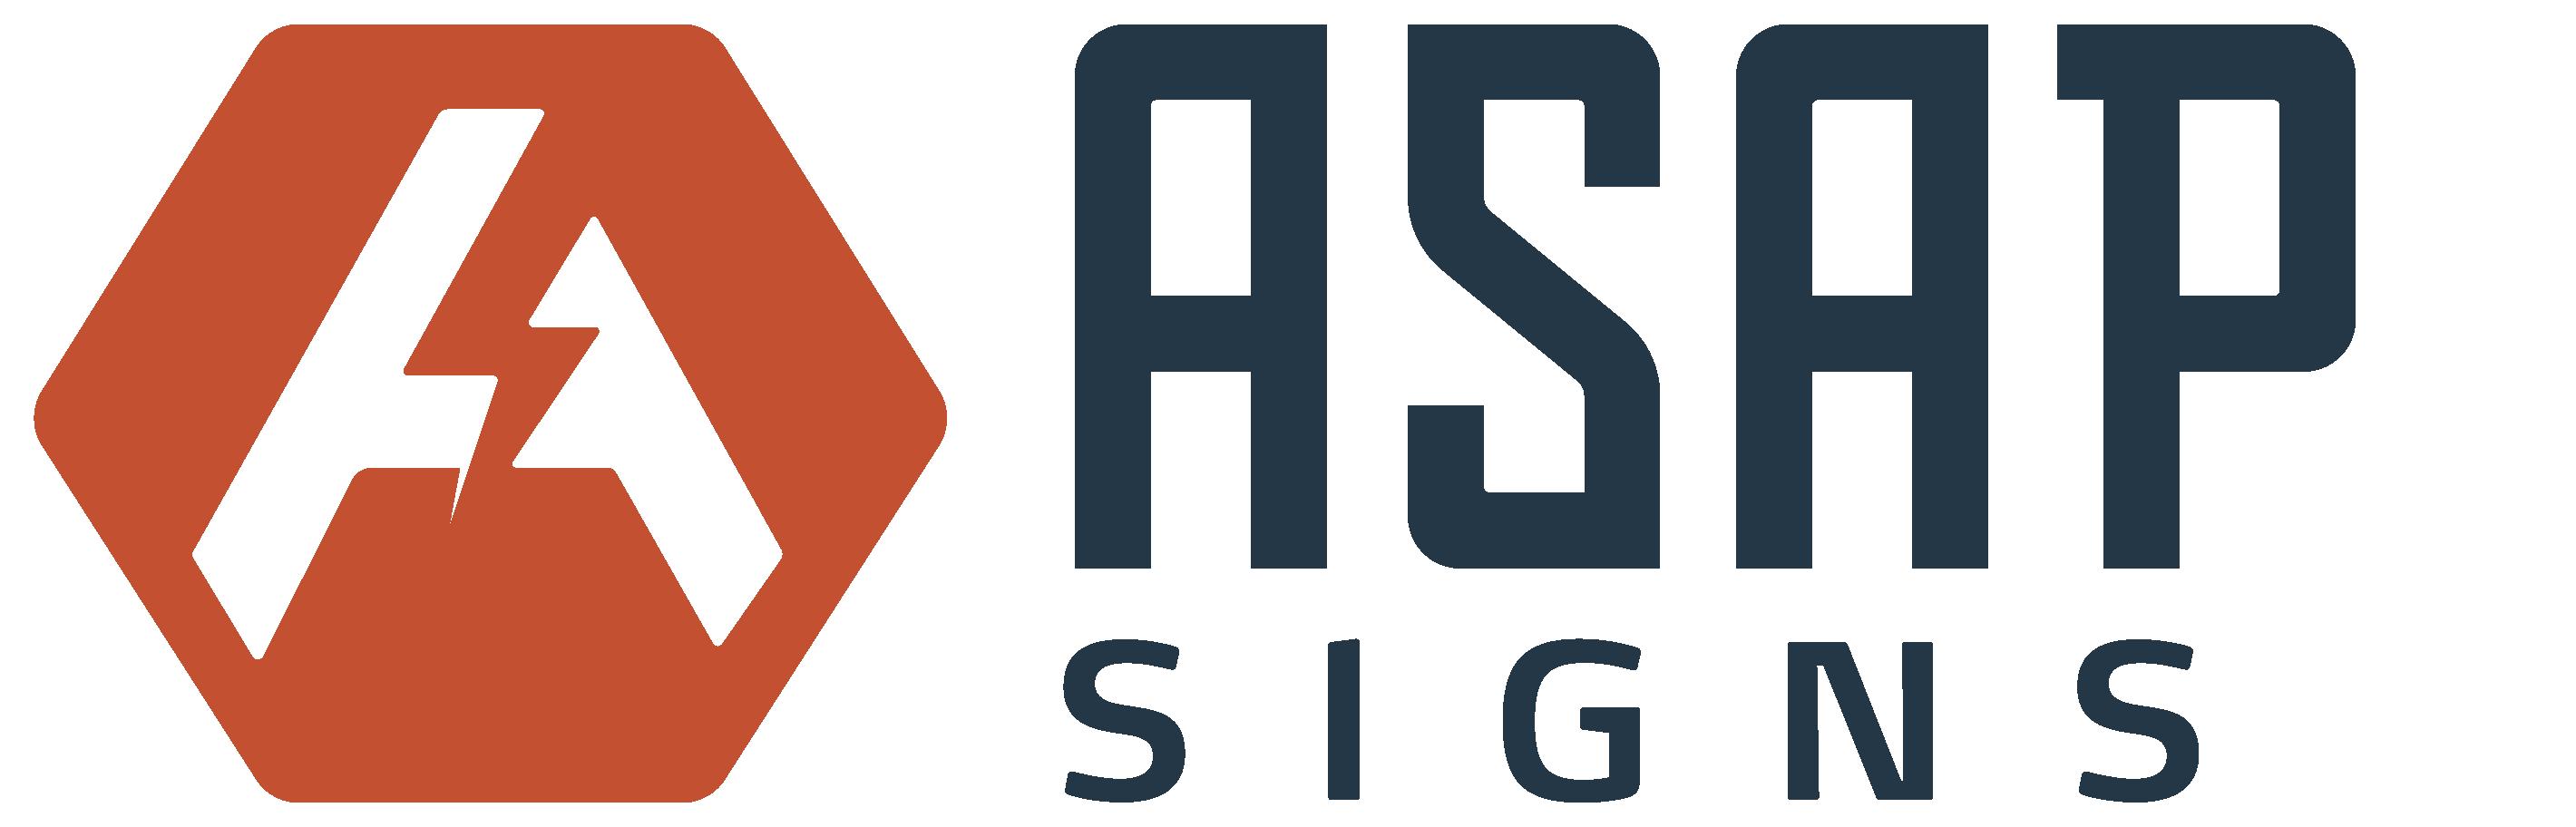 IDENT Industrial Signage